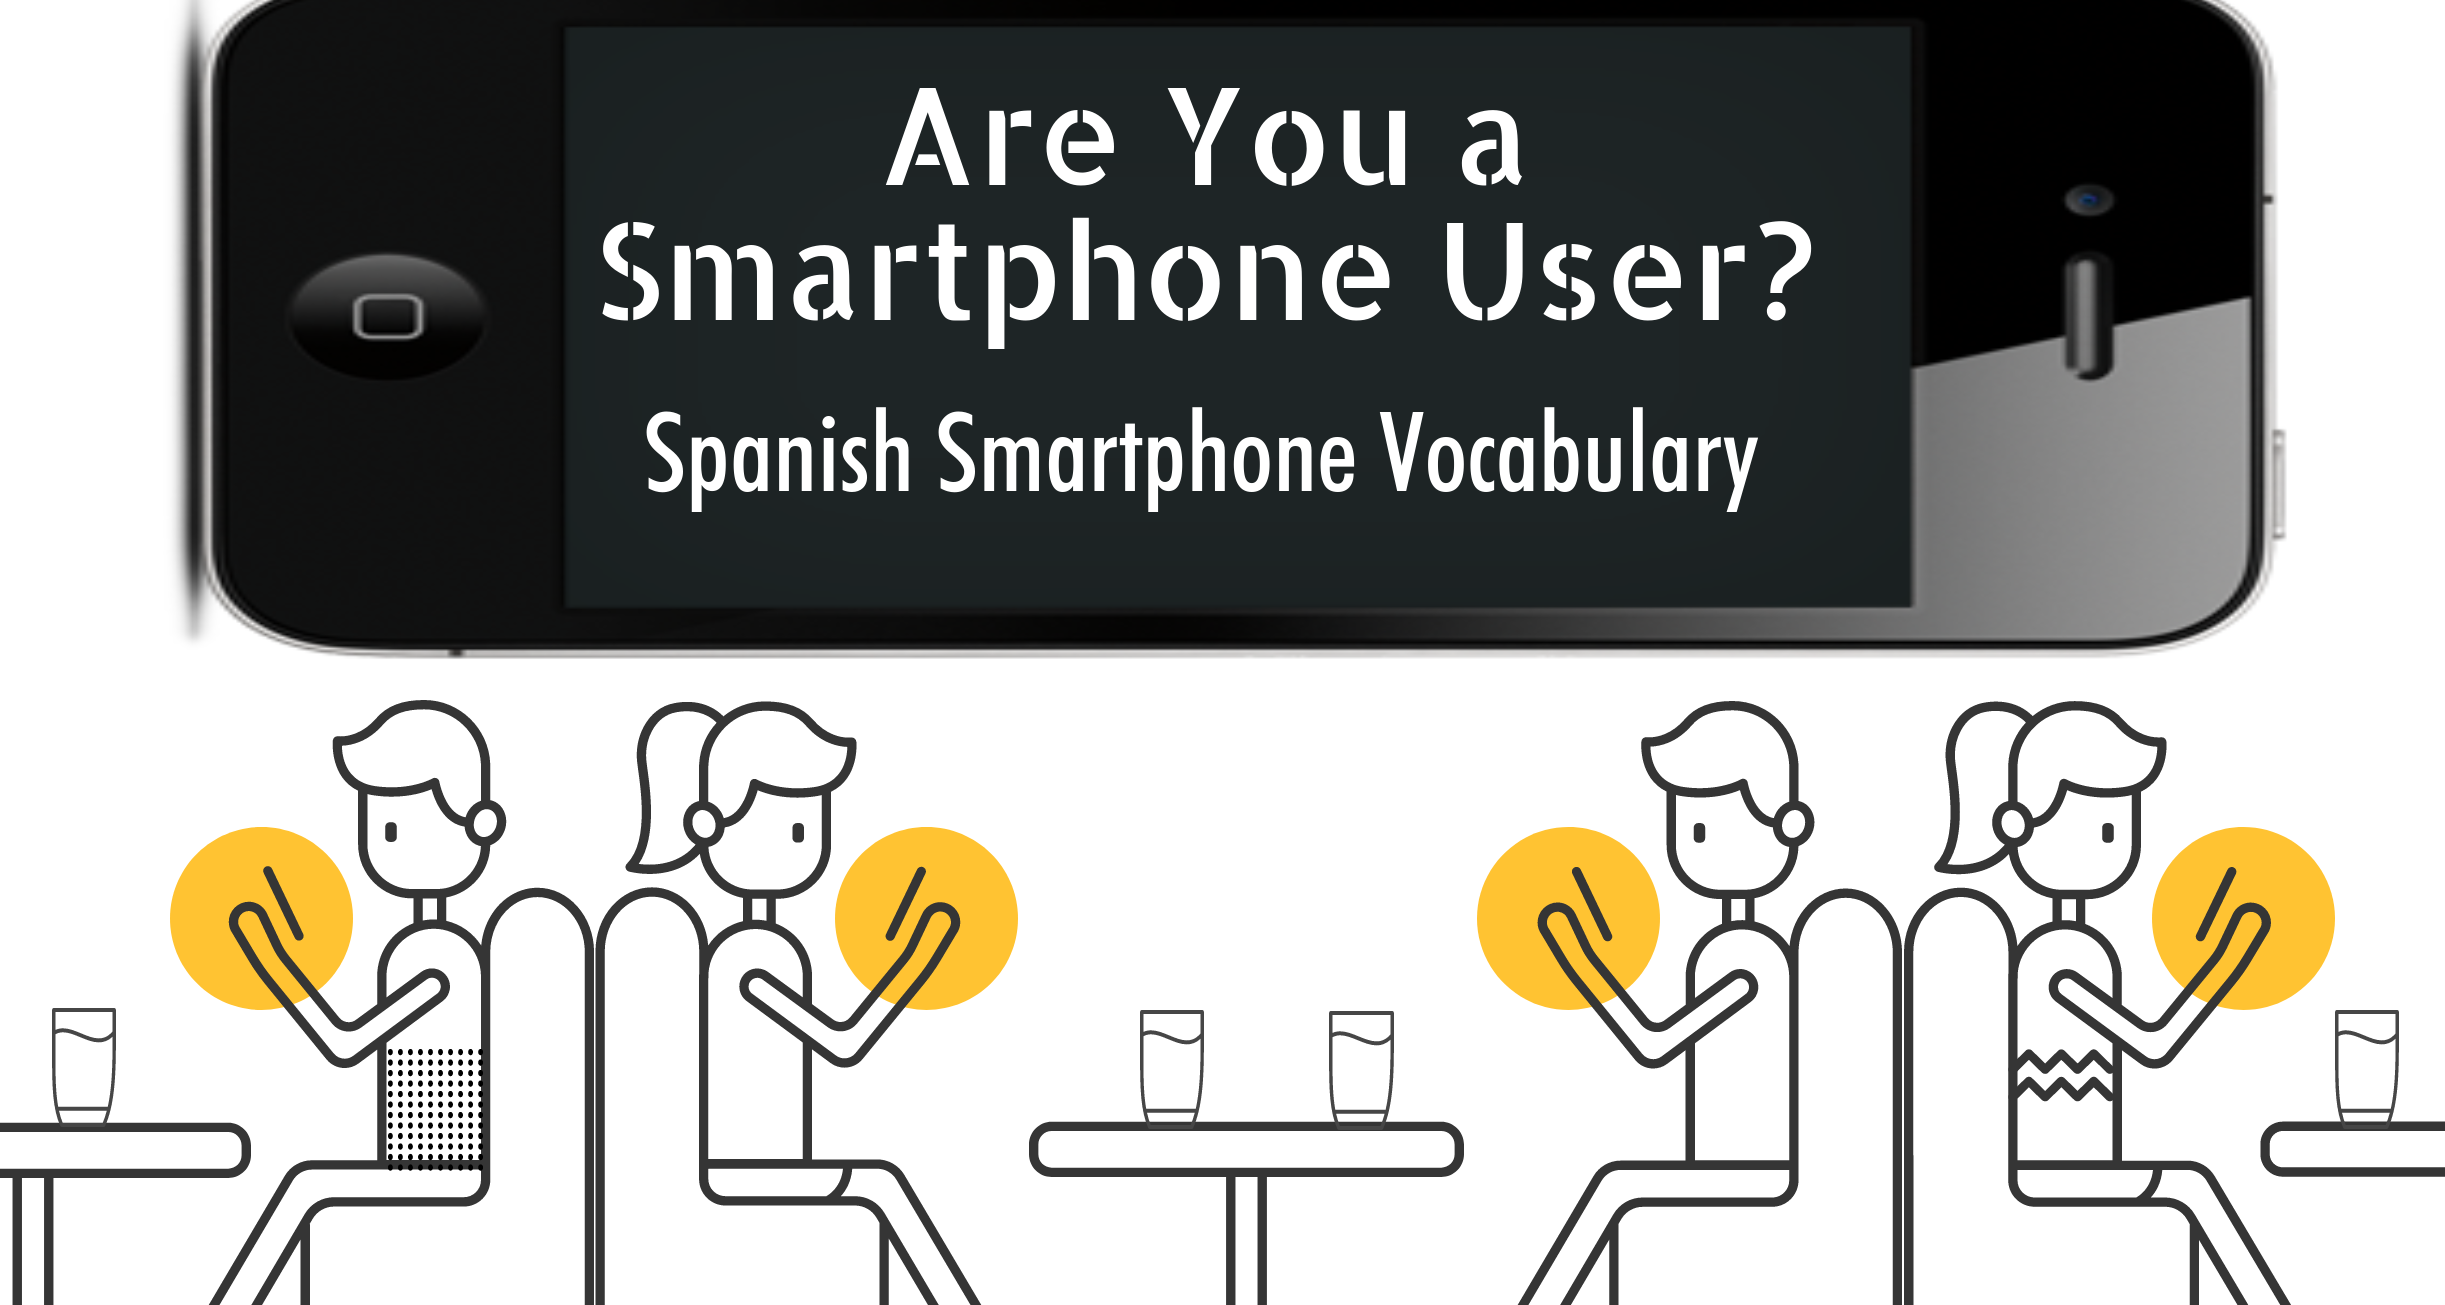 Are You A Smartphone User? Spanish Smartphone Vocabulary